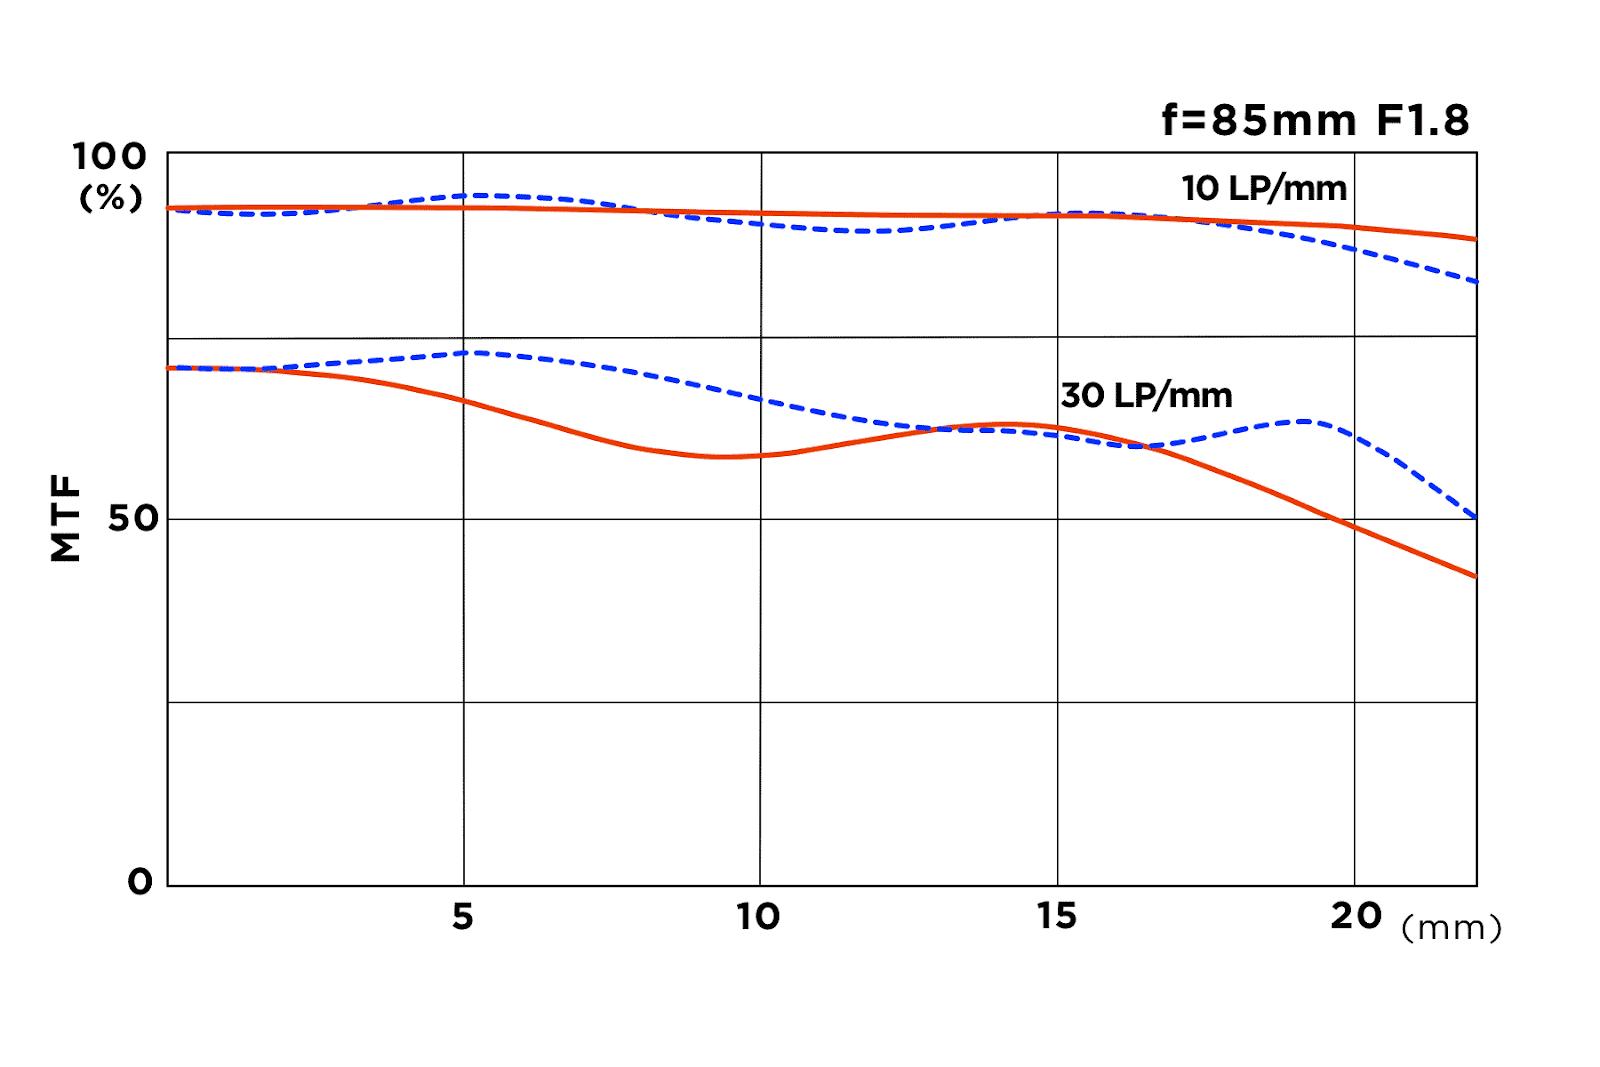 MFT-график объектива Tokina ATX-M 85mm f/1.8 FE